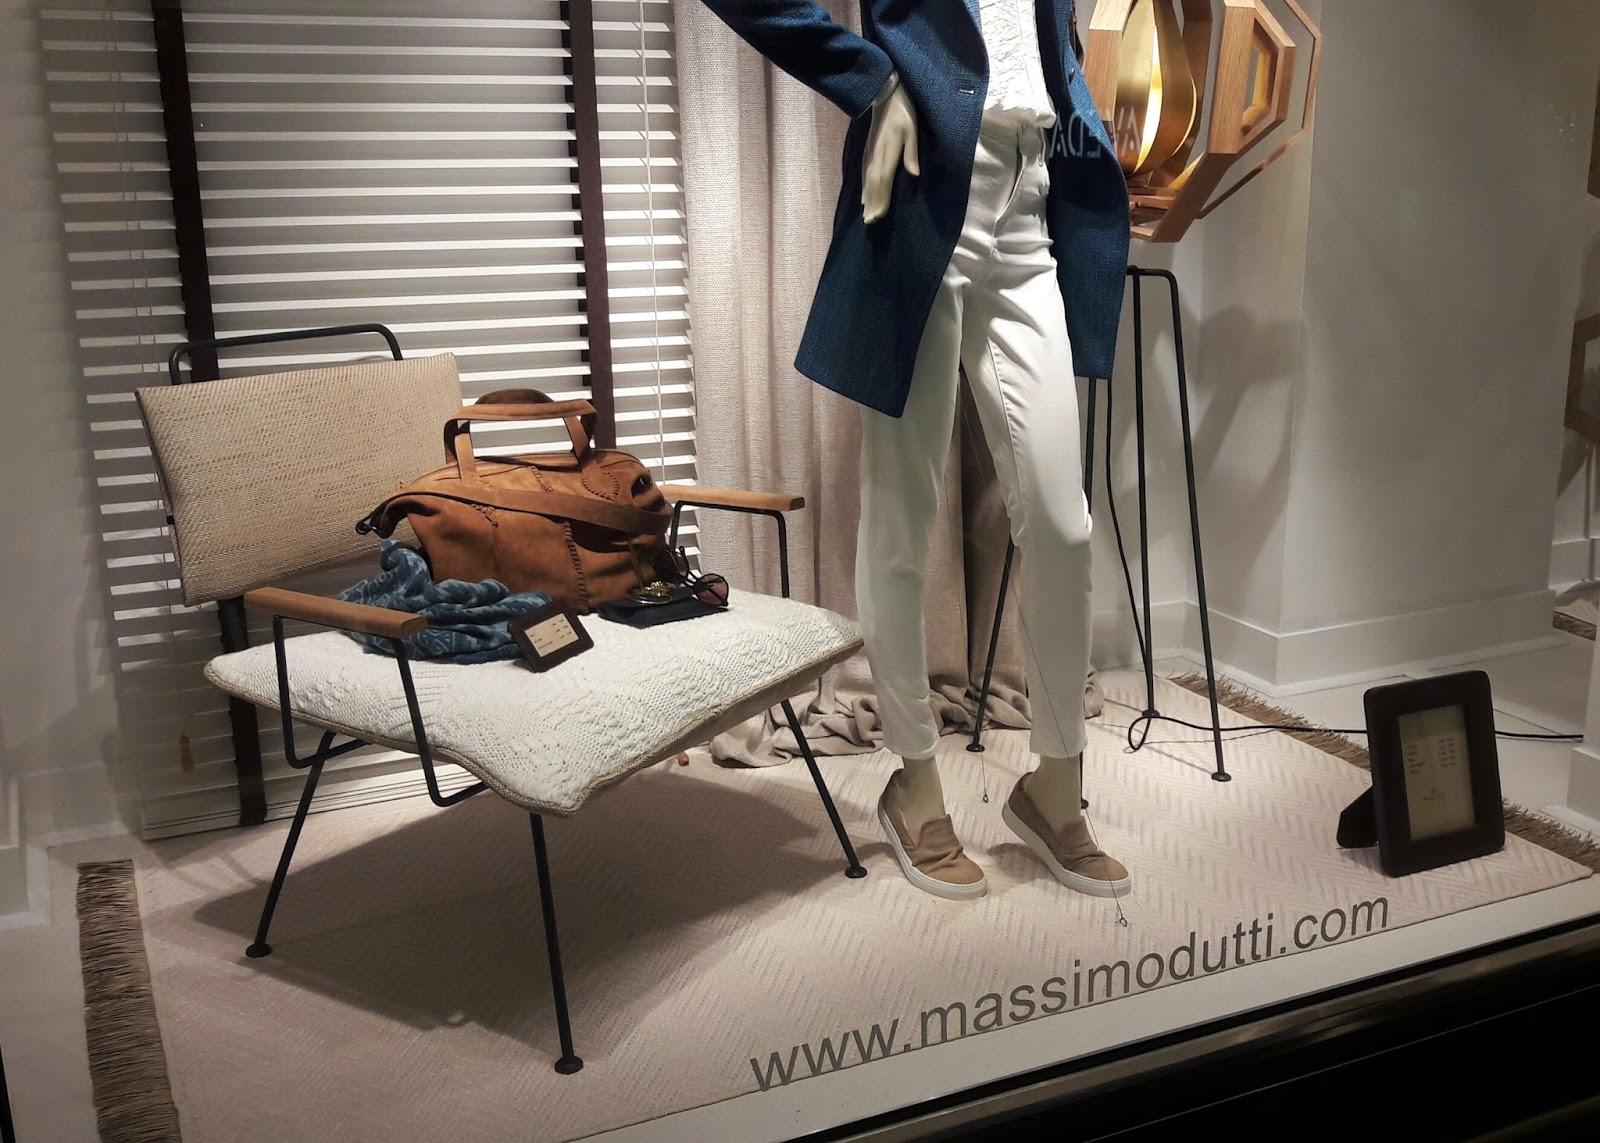 Madrid Massimo Dutti Photo Taken At Massimo Dutti By Salem J On  # Muebles De Massimo Dutti